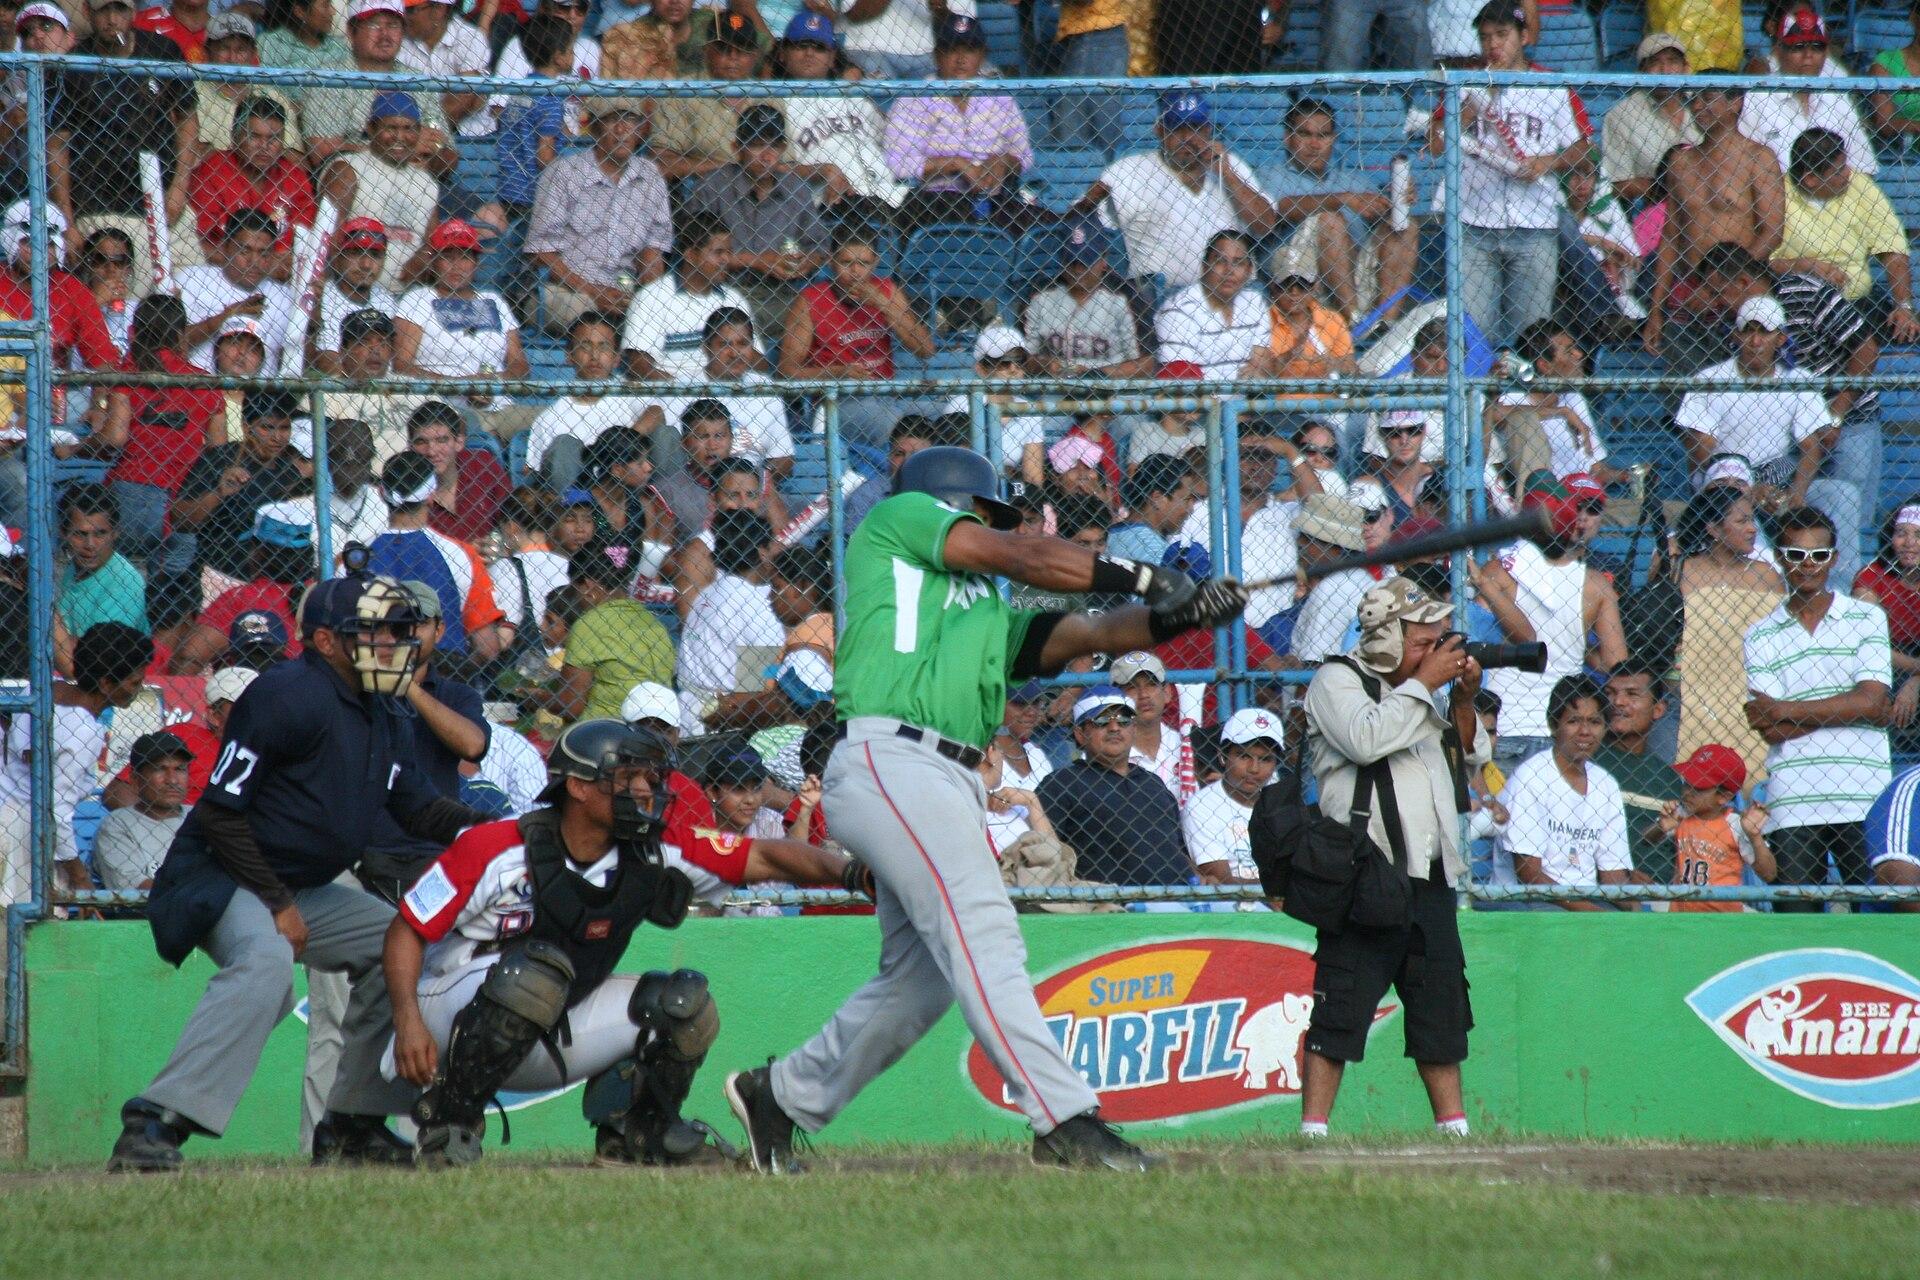 history of baseball in nicaragua wikipedia. Black Bedroom Furniture Sets. Home Design Ideas